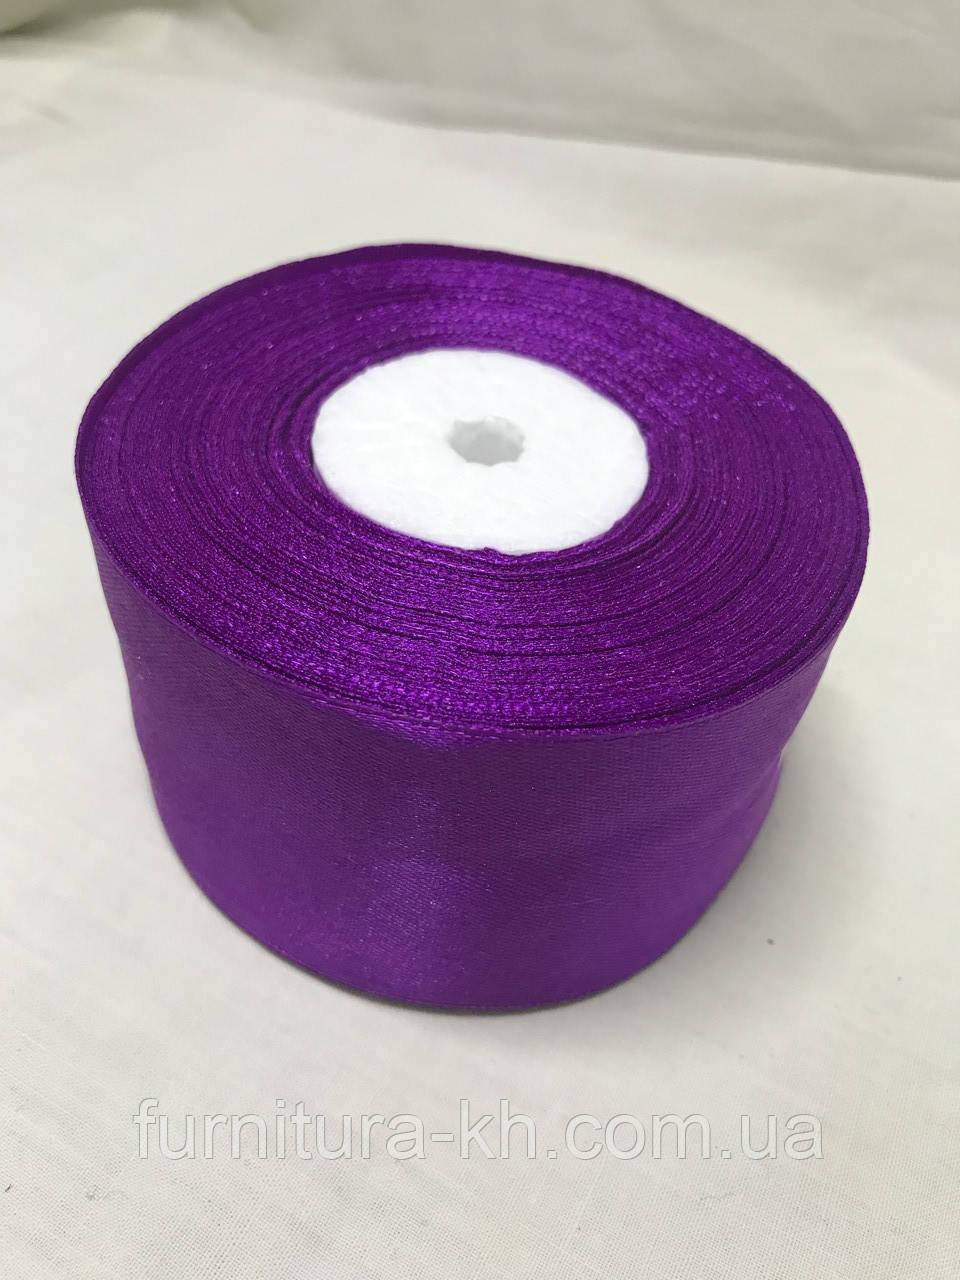 Лента атласная,ширина 5 см  (33 м ) цвет фиолетовый